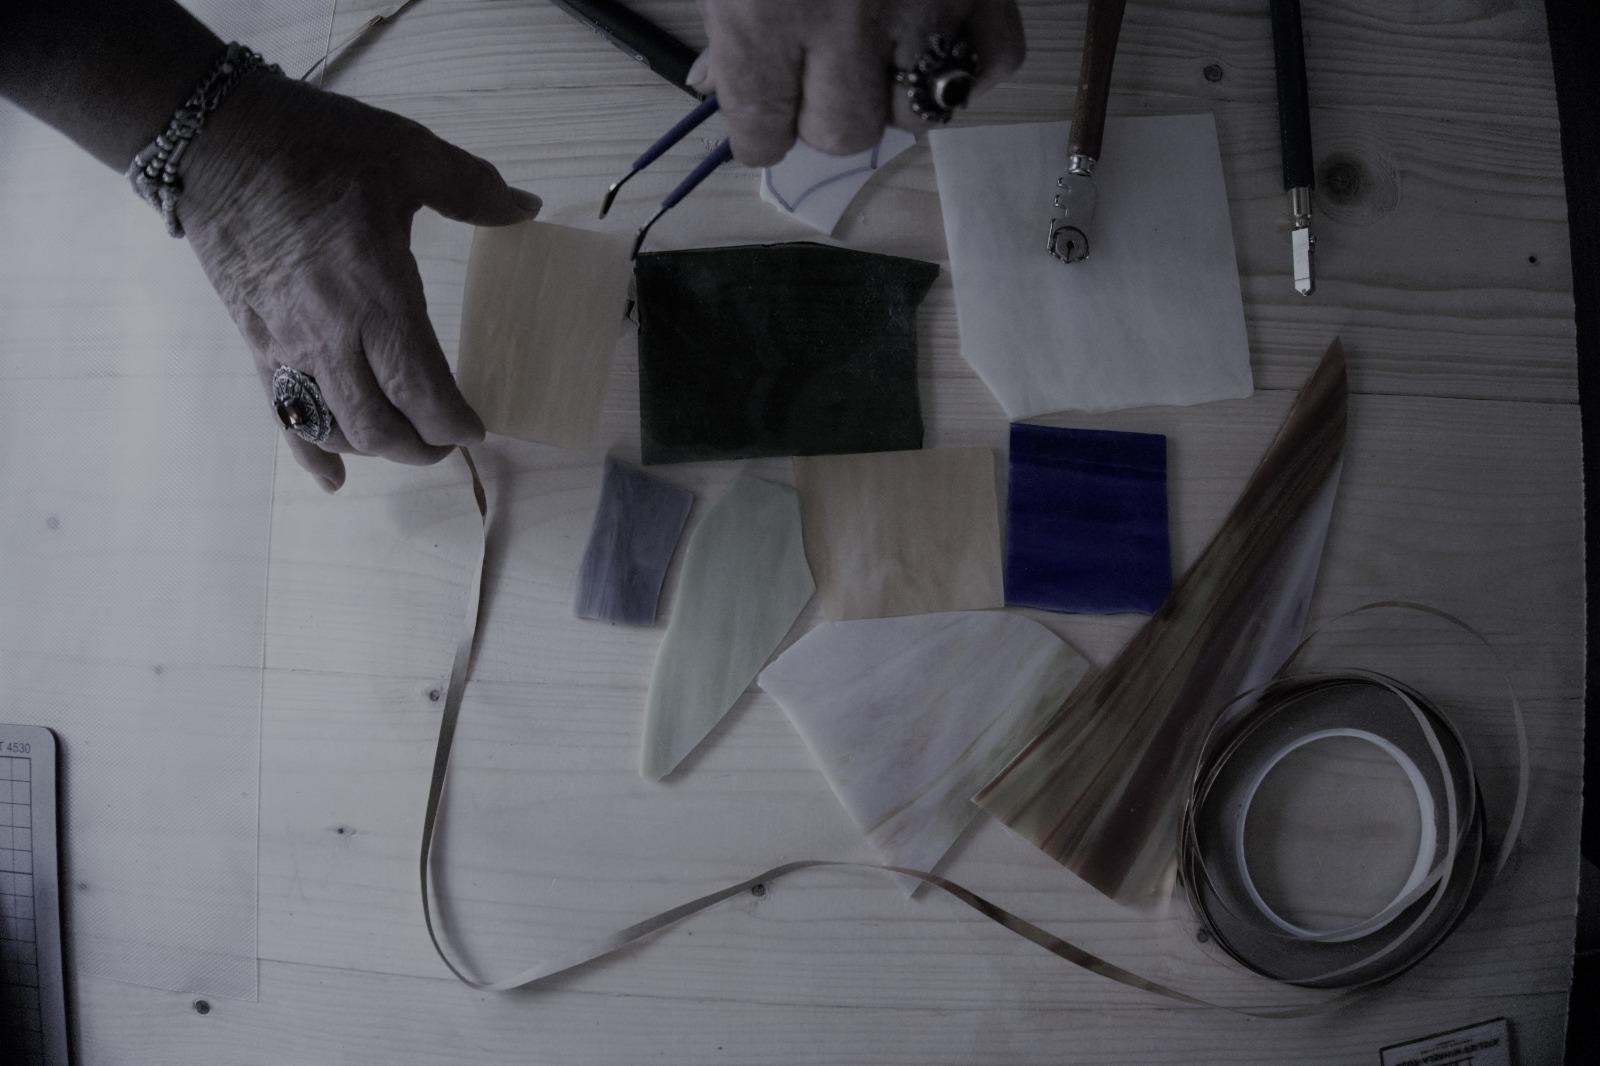 tehnica-mixta-atelier-mihaela-rosu